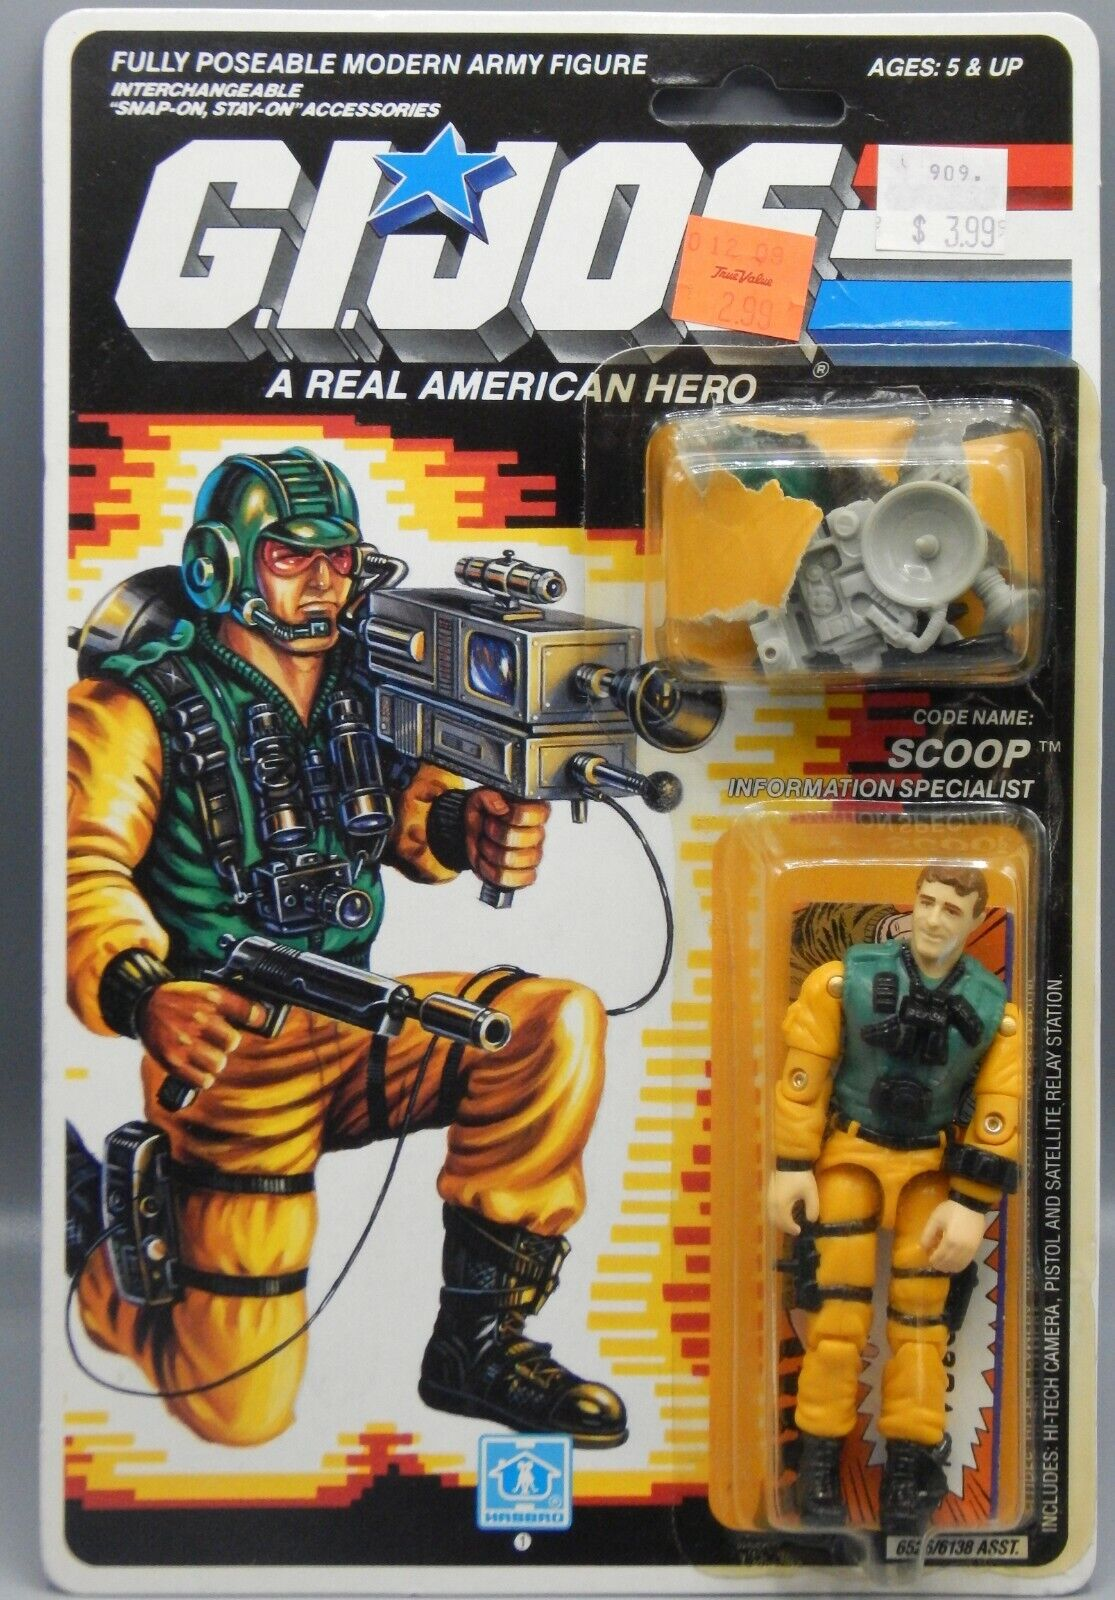 Vintage 1989 Hasbro GI Joe SCOOP azione cifra completare wautodback ARAH giocattolo